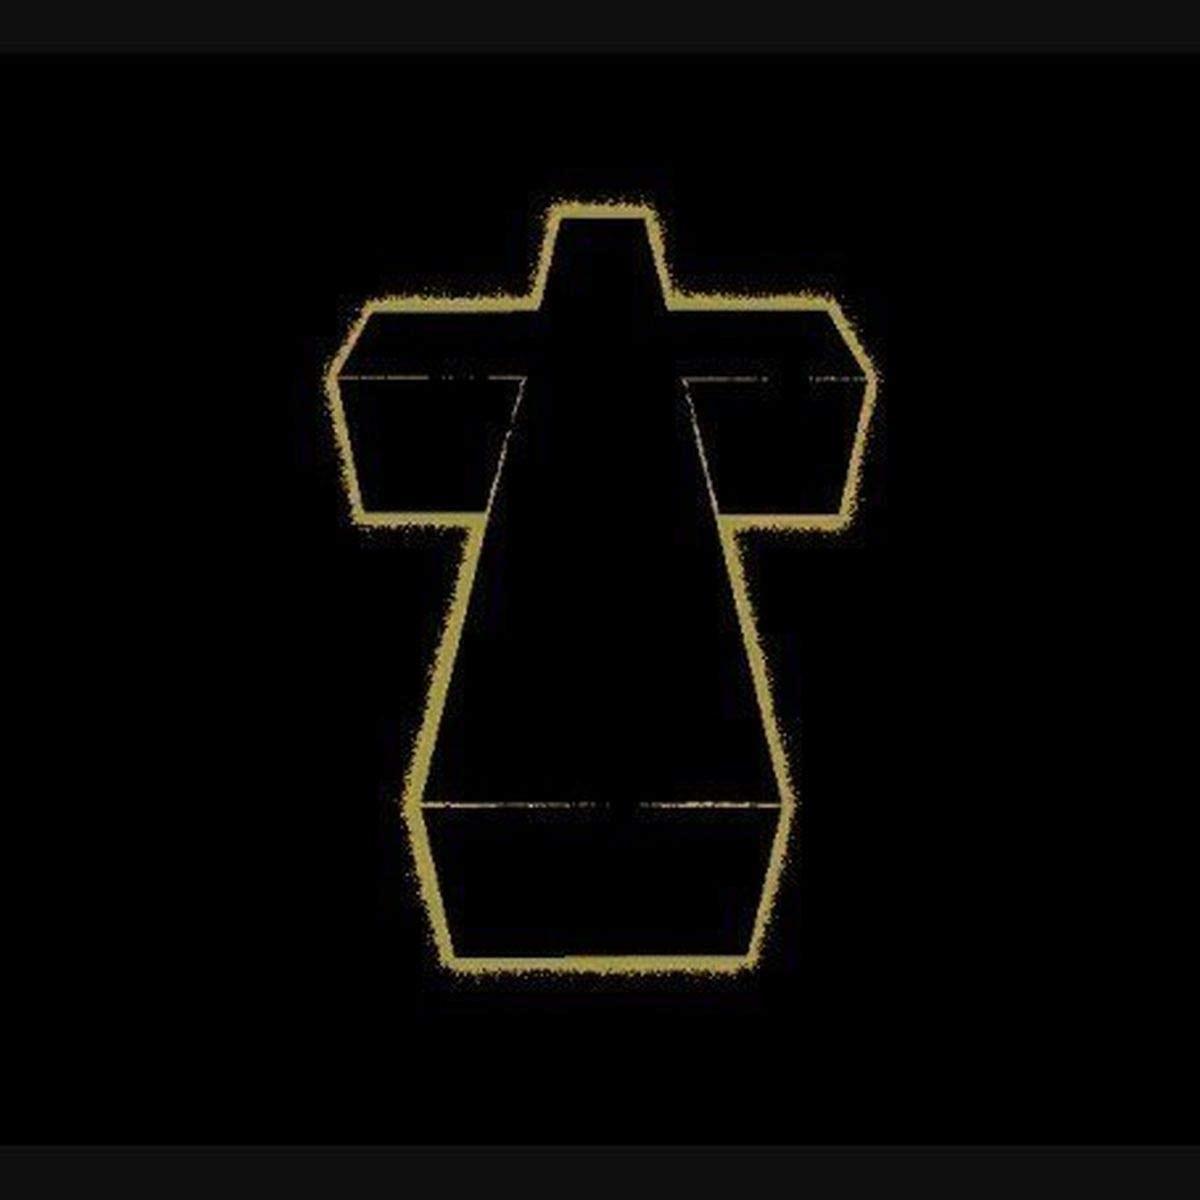 Cross-Justice-1625171093